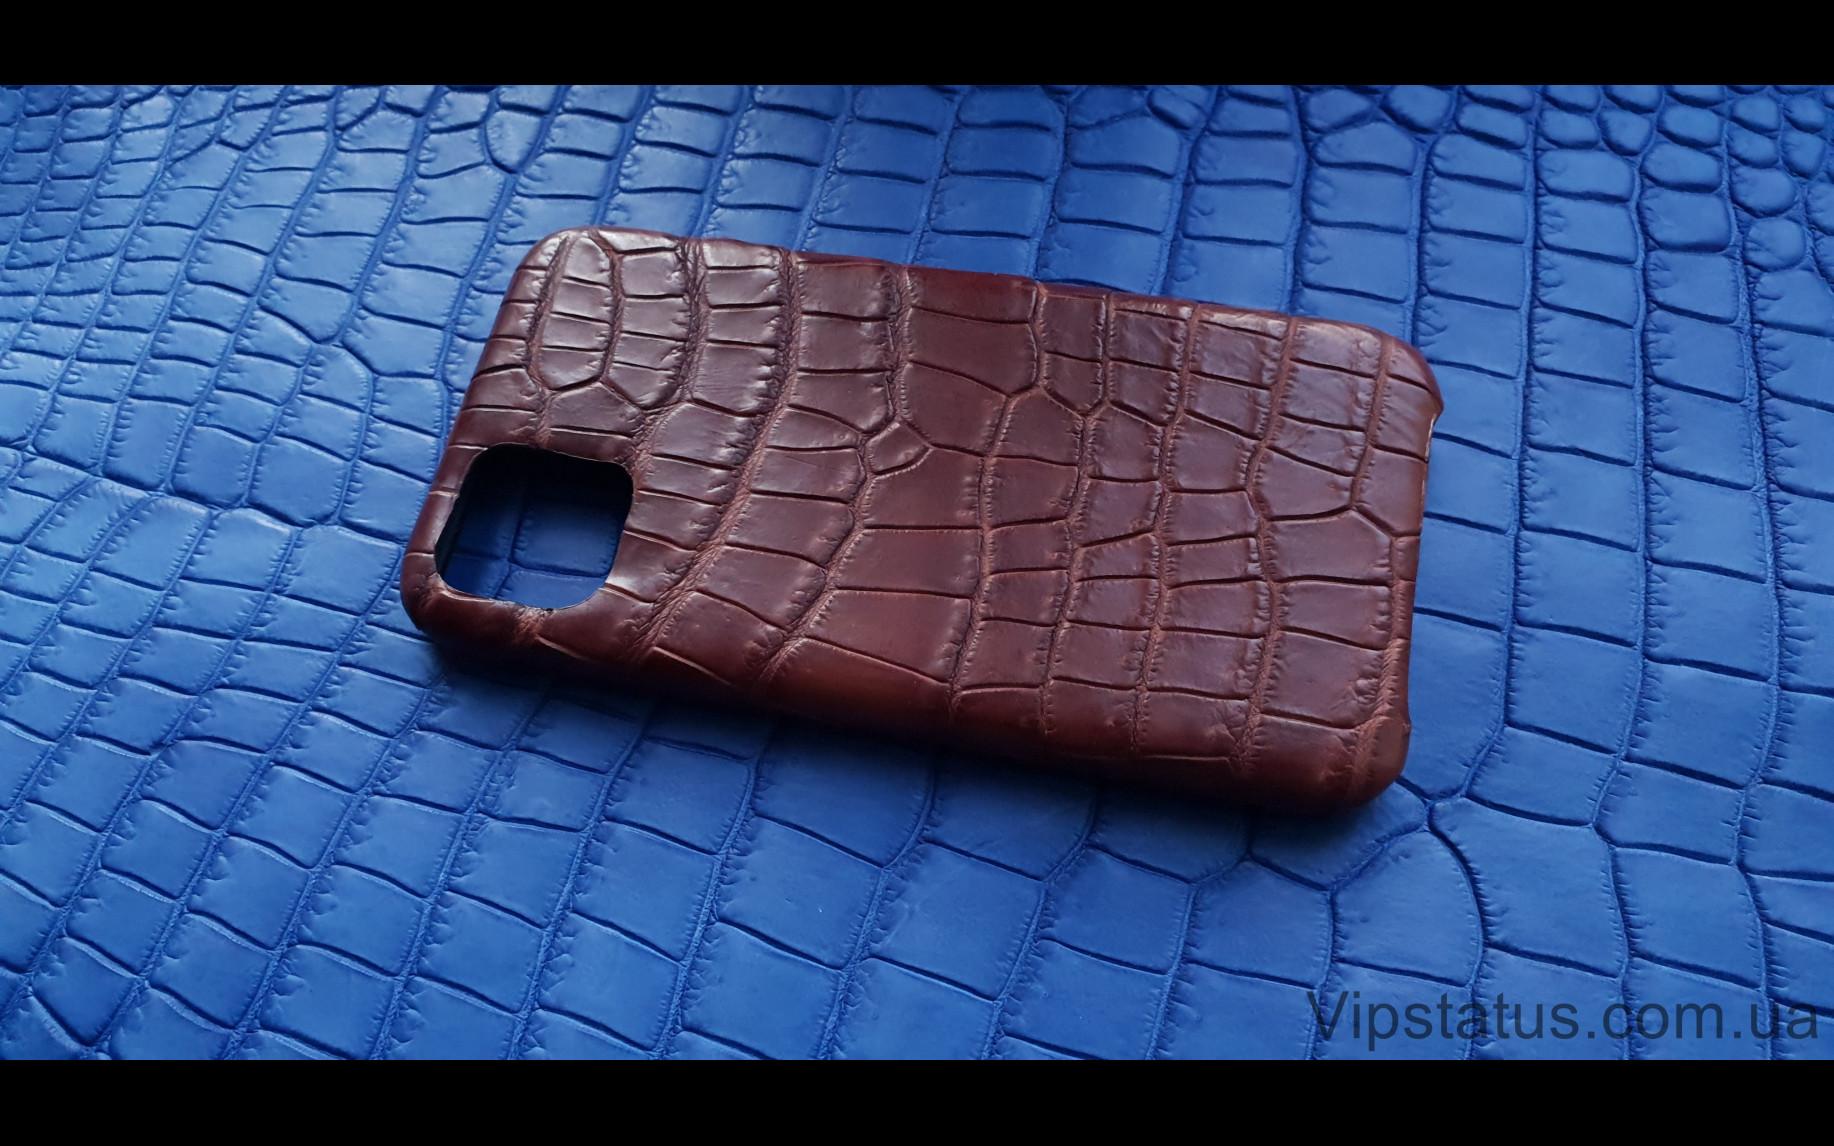 Elite Rich Crocodile Эксклюзивный чехол IPhone 11 Pro Max Rich Crocodile Exclusive case IPhone 11 Pro Max Crocodile leather image 2